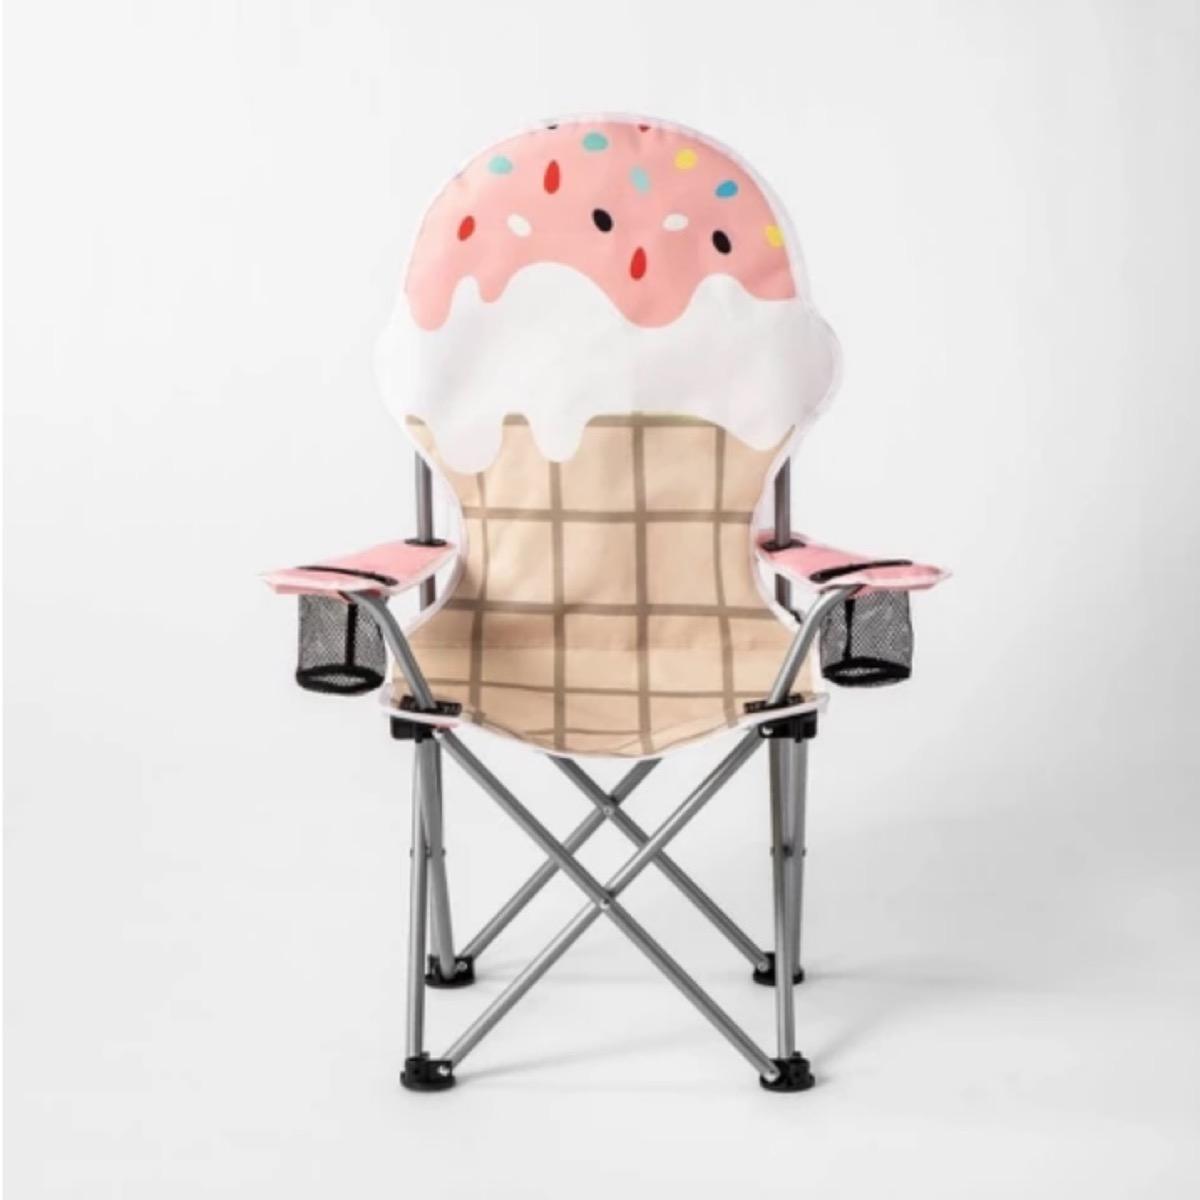 kids ice cream cone chair, target beach essentials